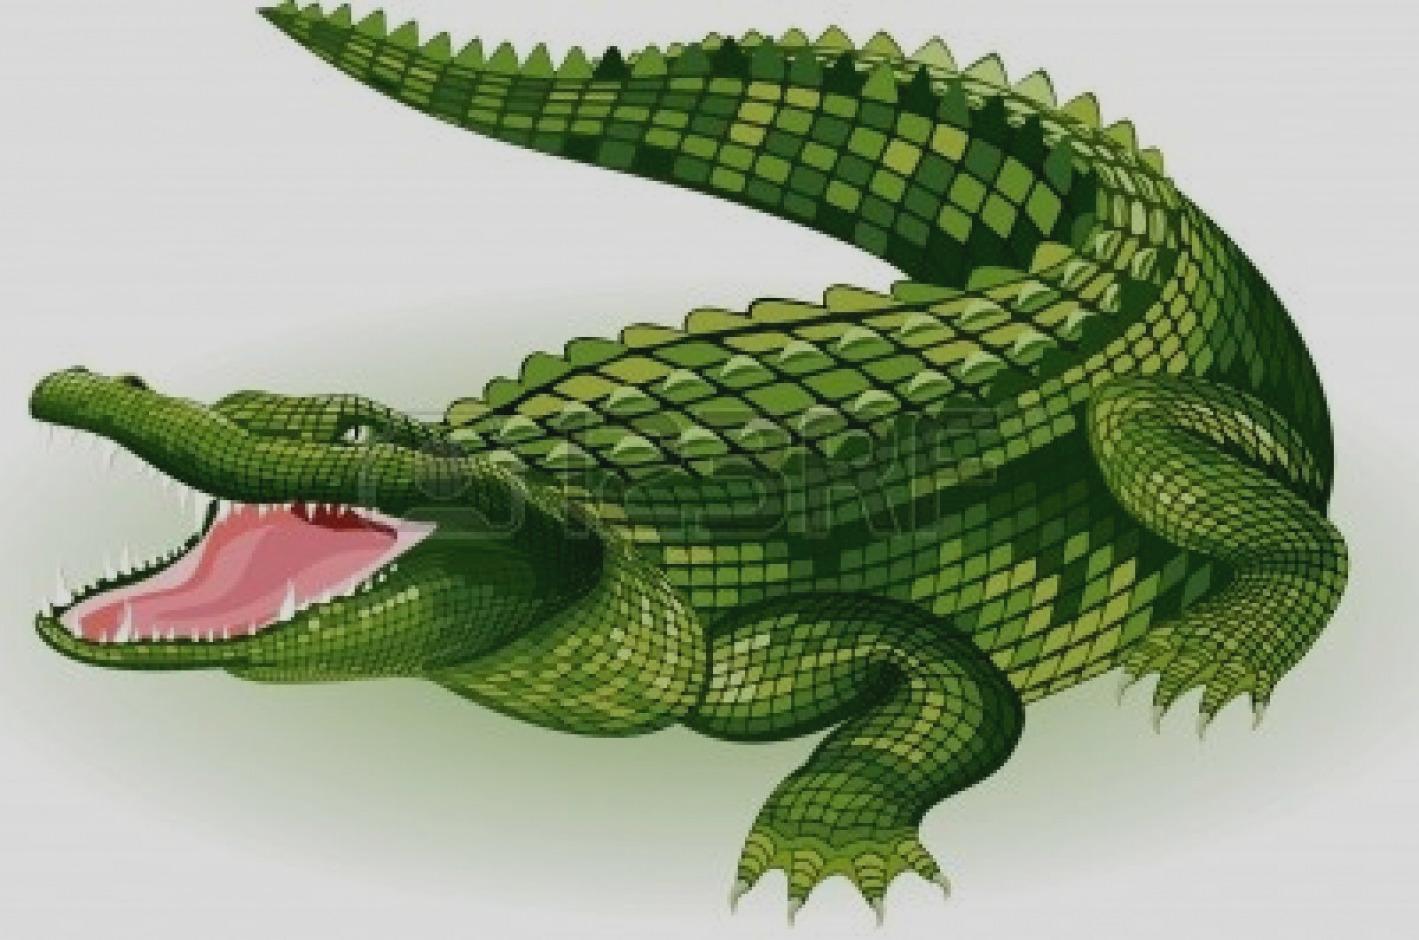 Alligator scary